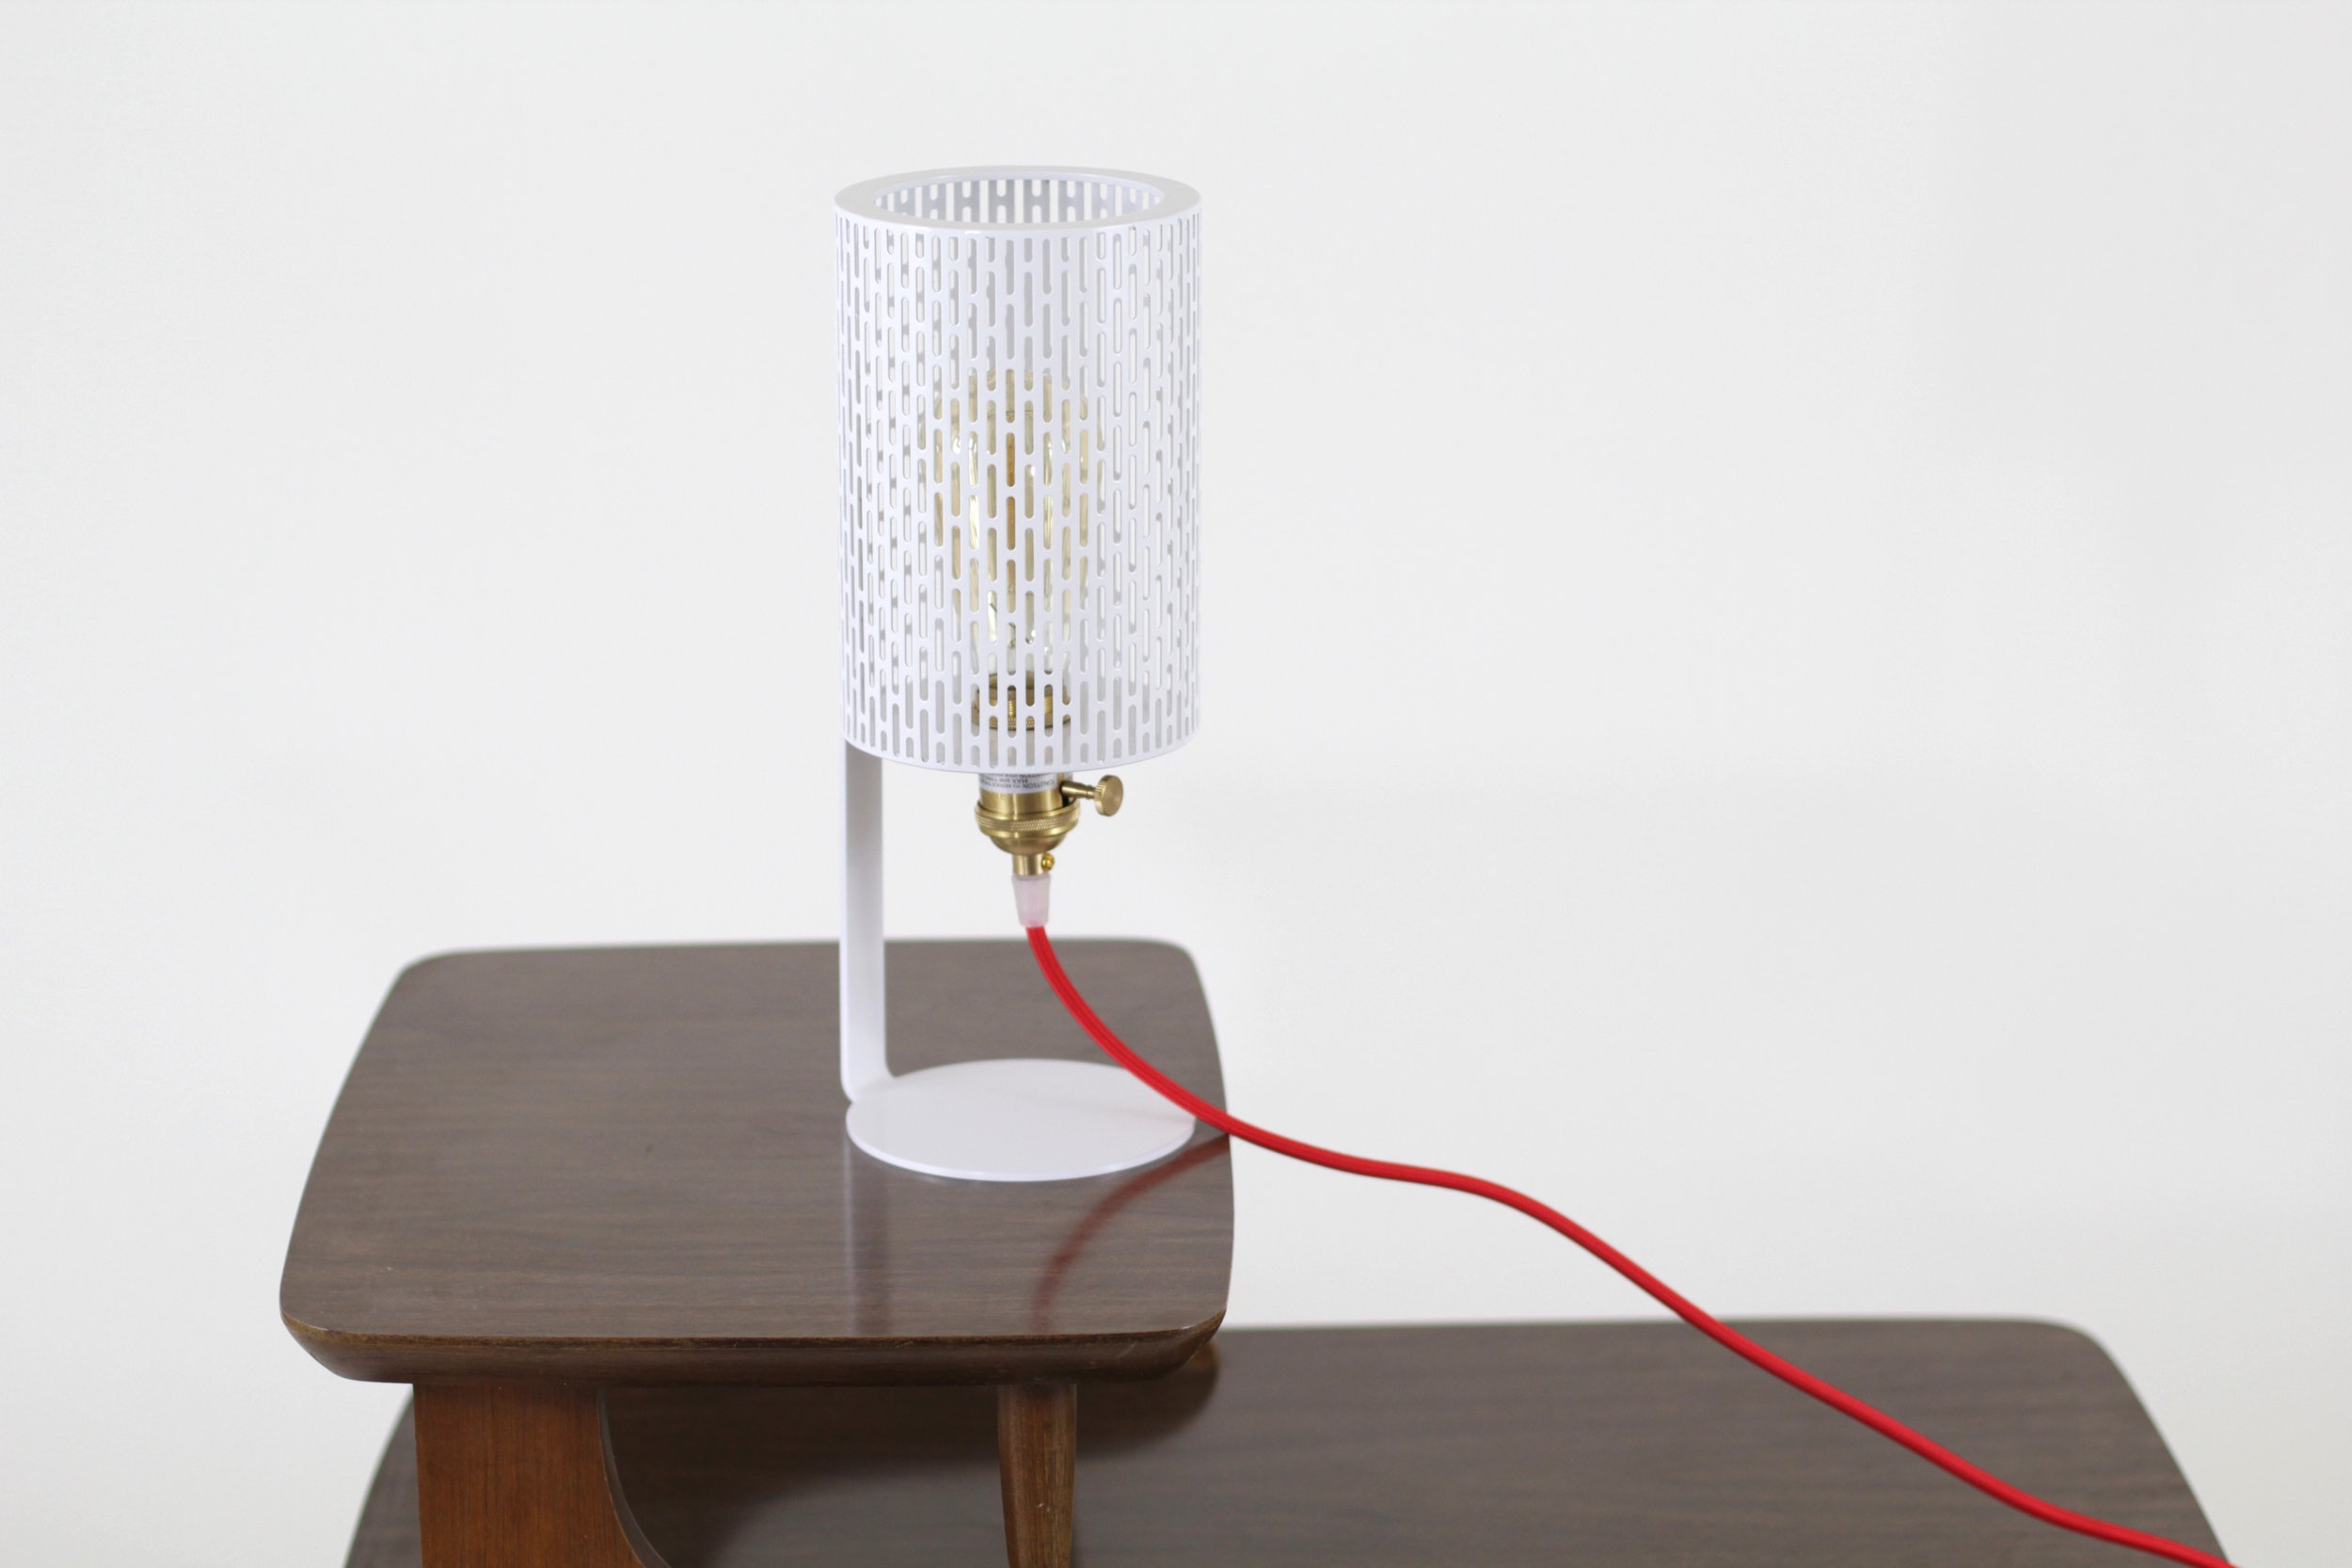 Deiter Lamp